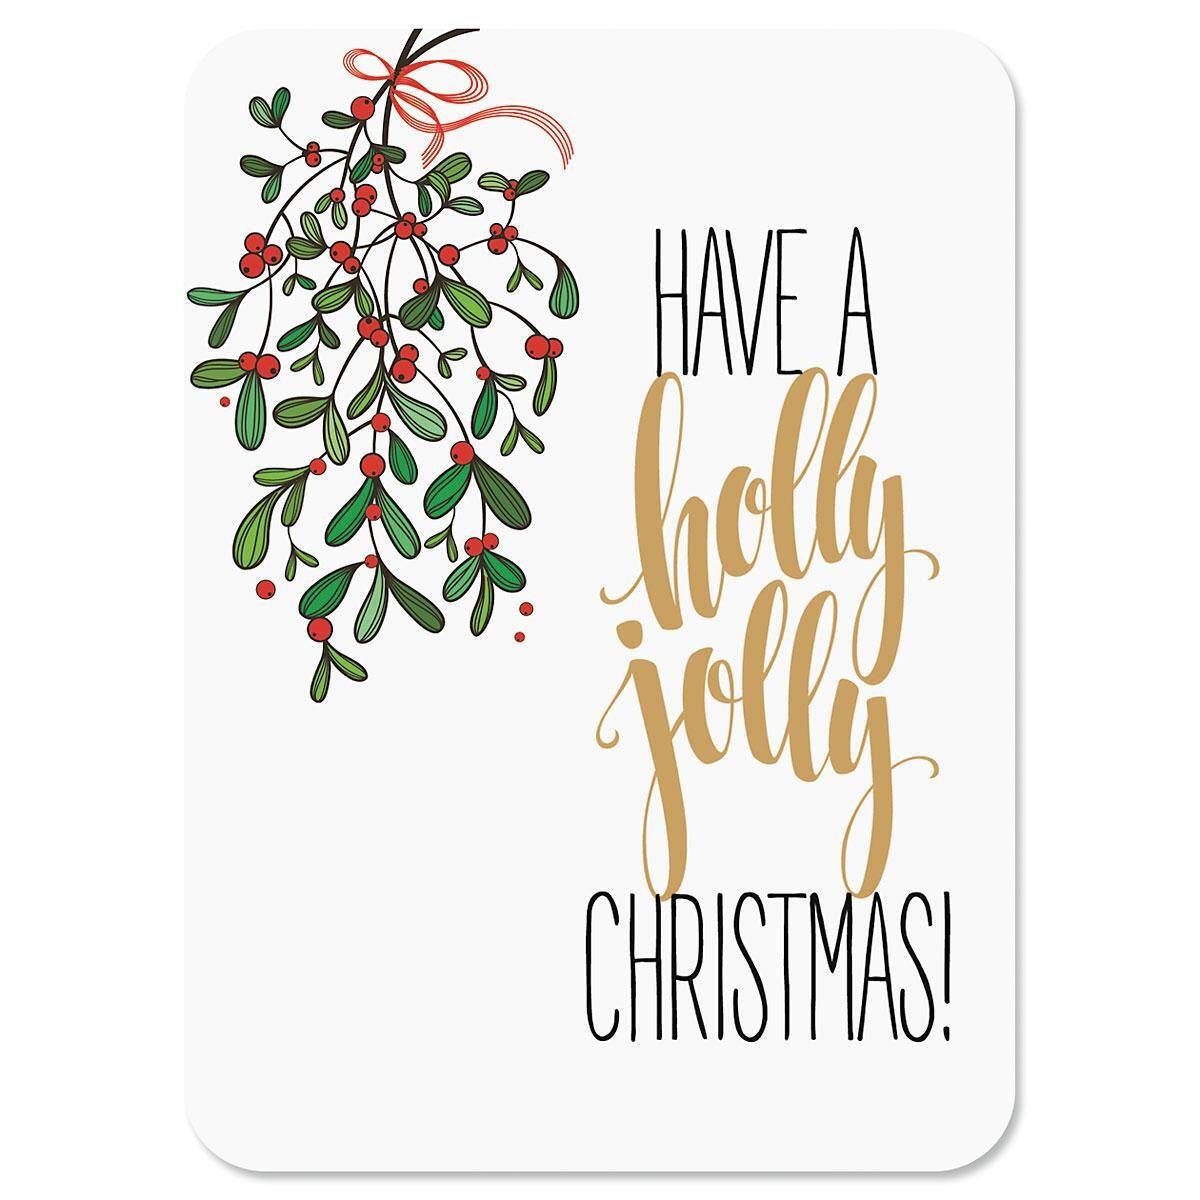 Under the Mistletoe Nonpersonalized Christmas Cards - Set of 18